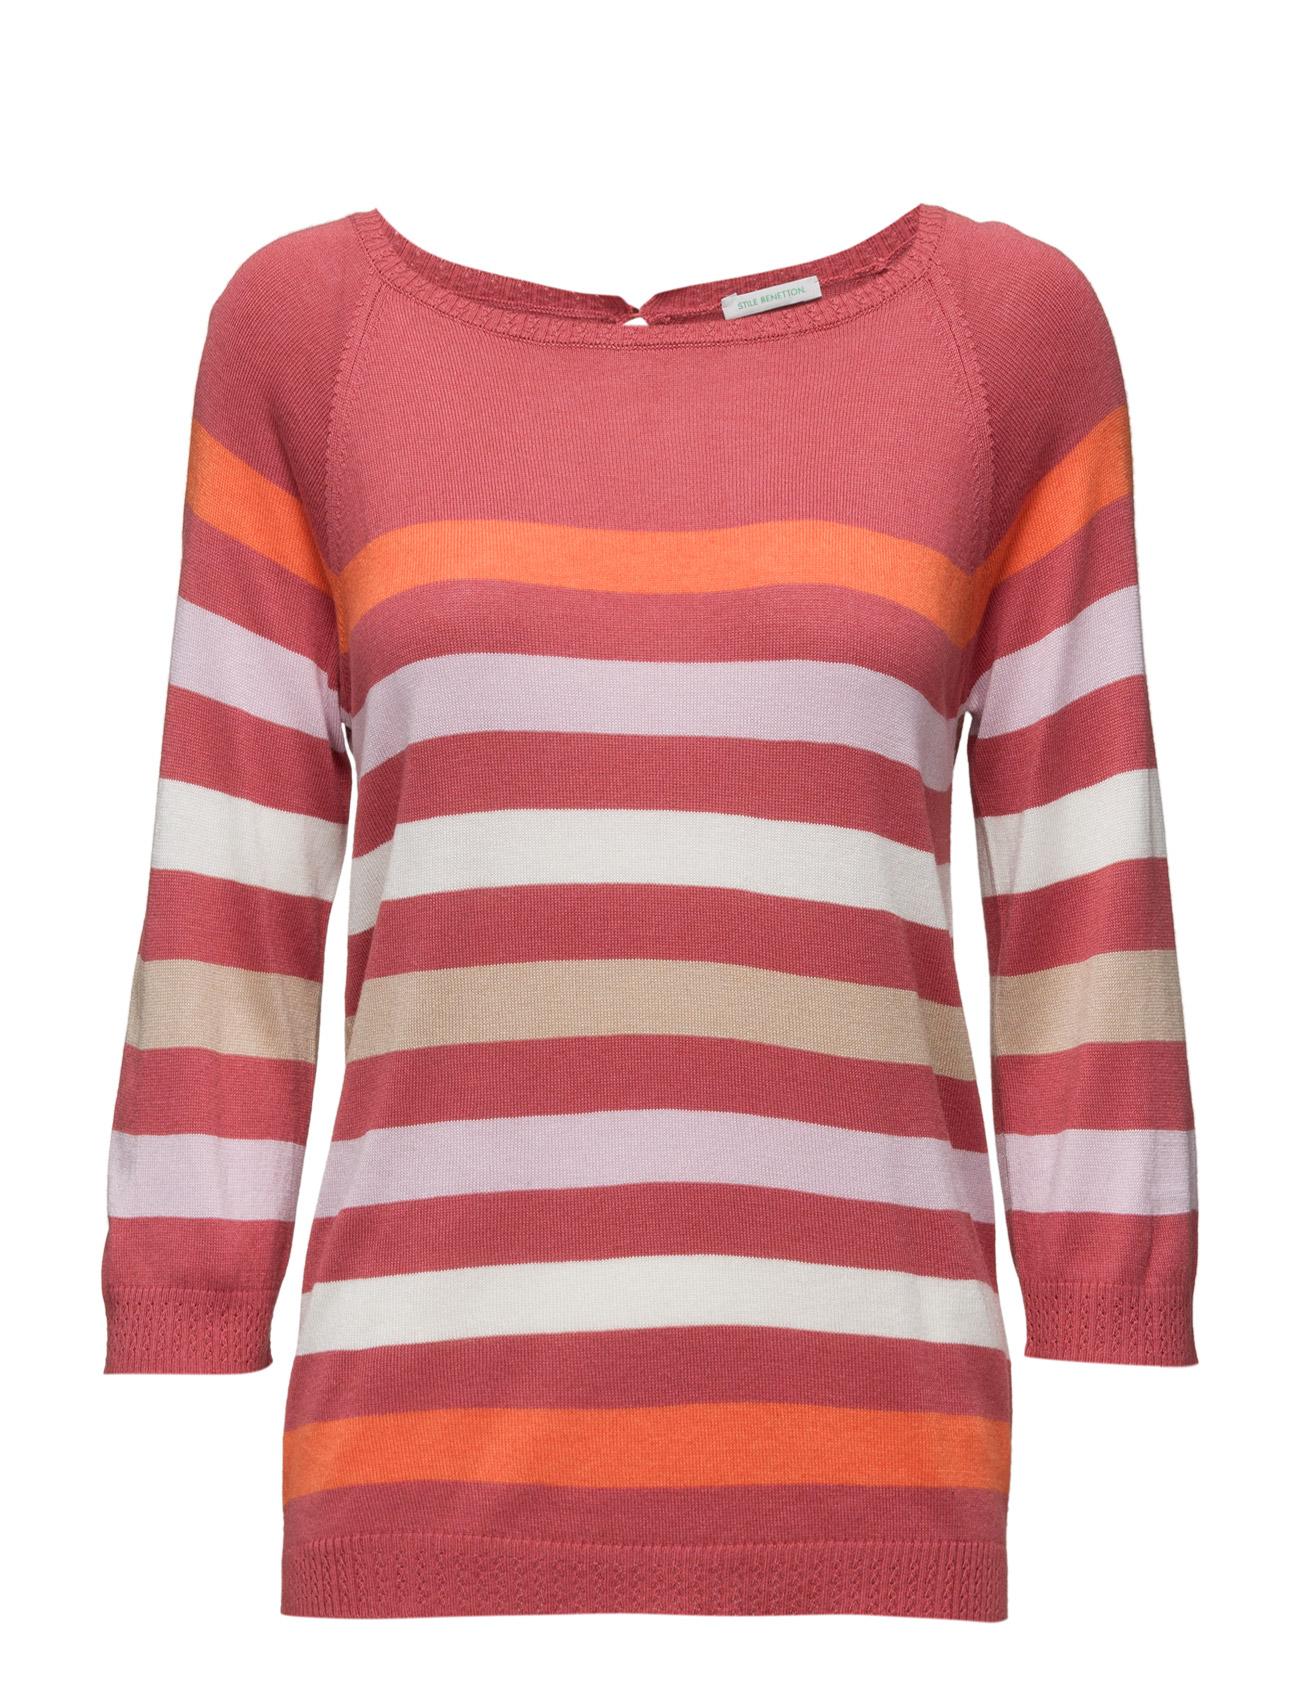 Sweater L/S United Colors of Benetton Sweatshirts til Kvinder i Rød